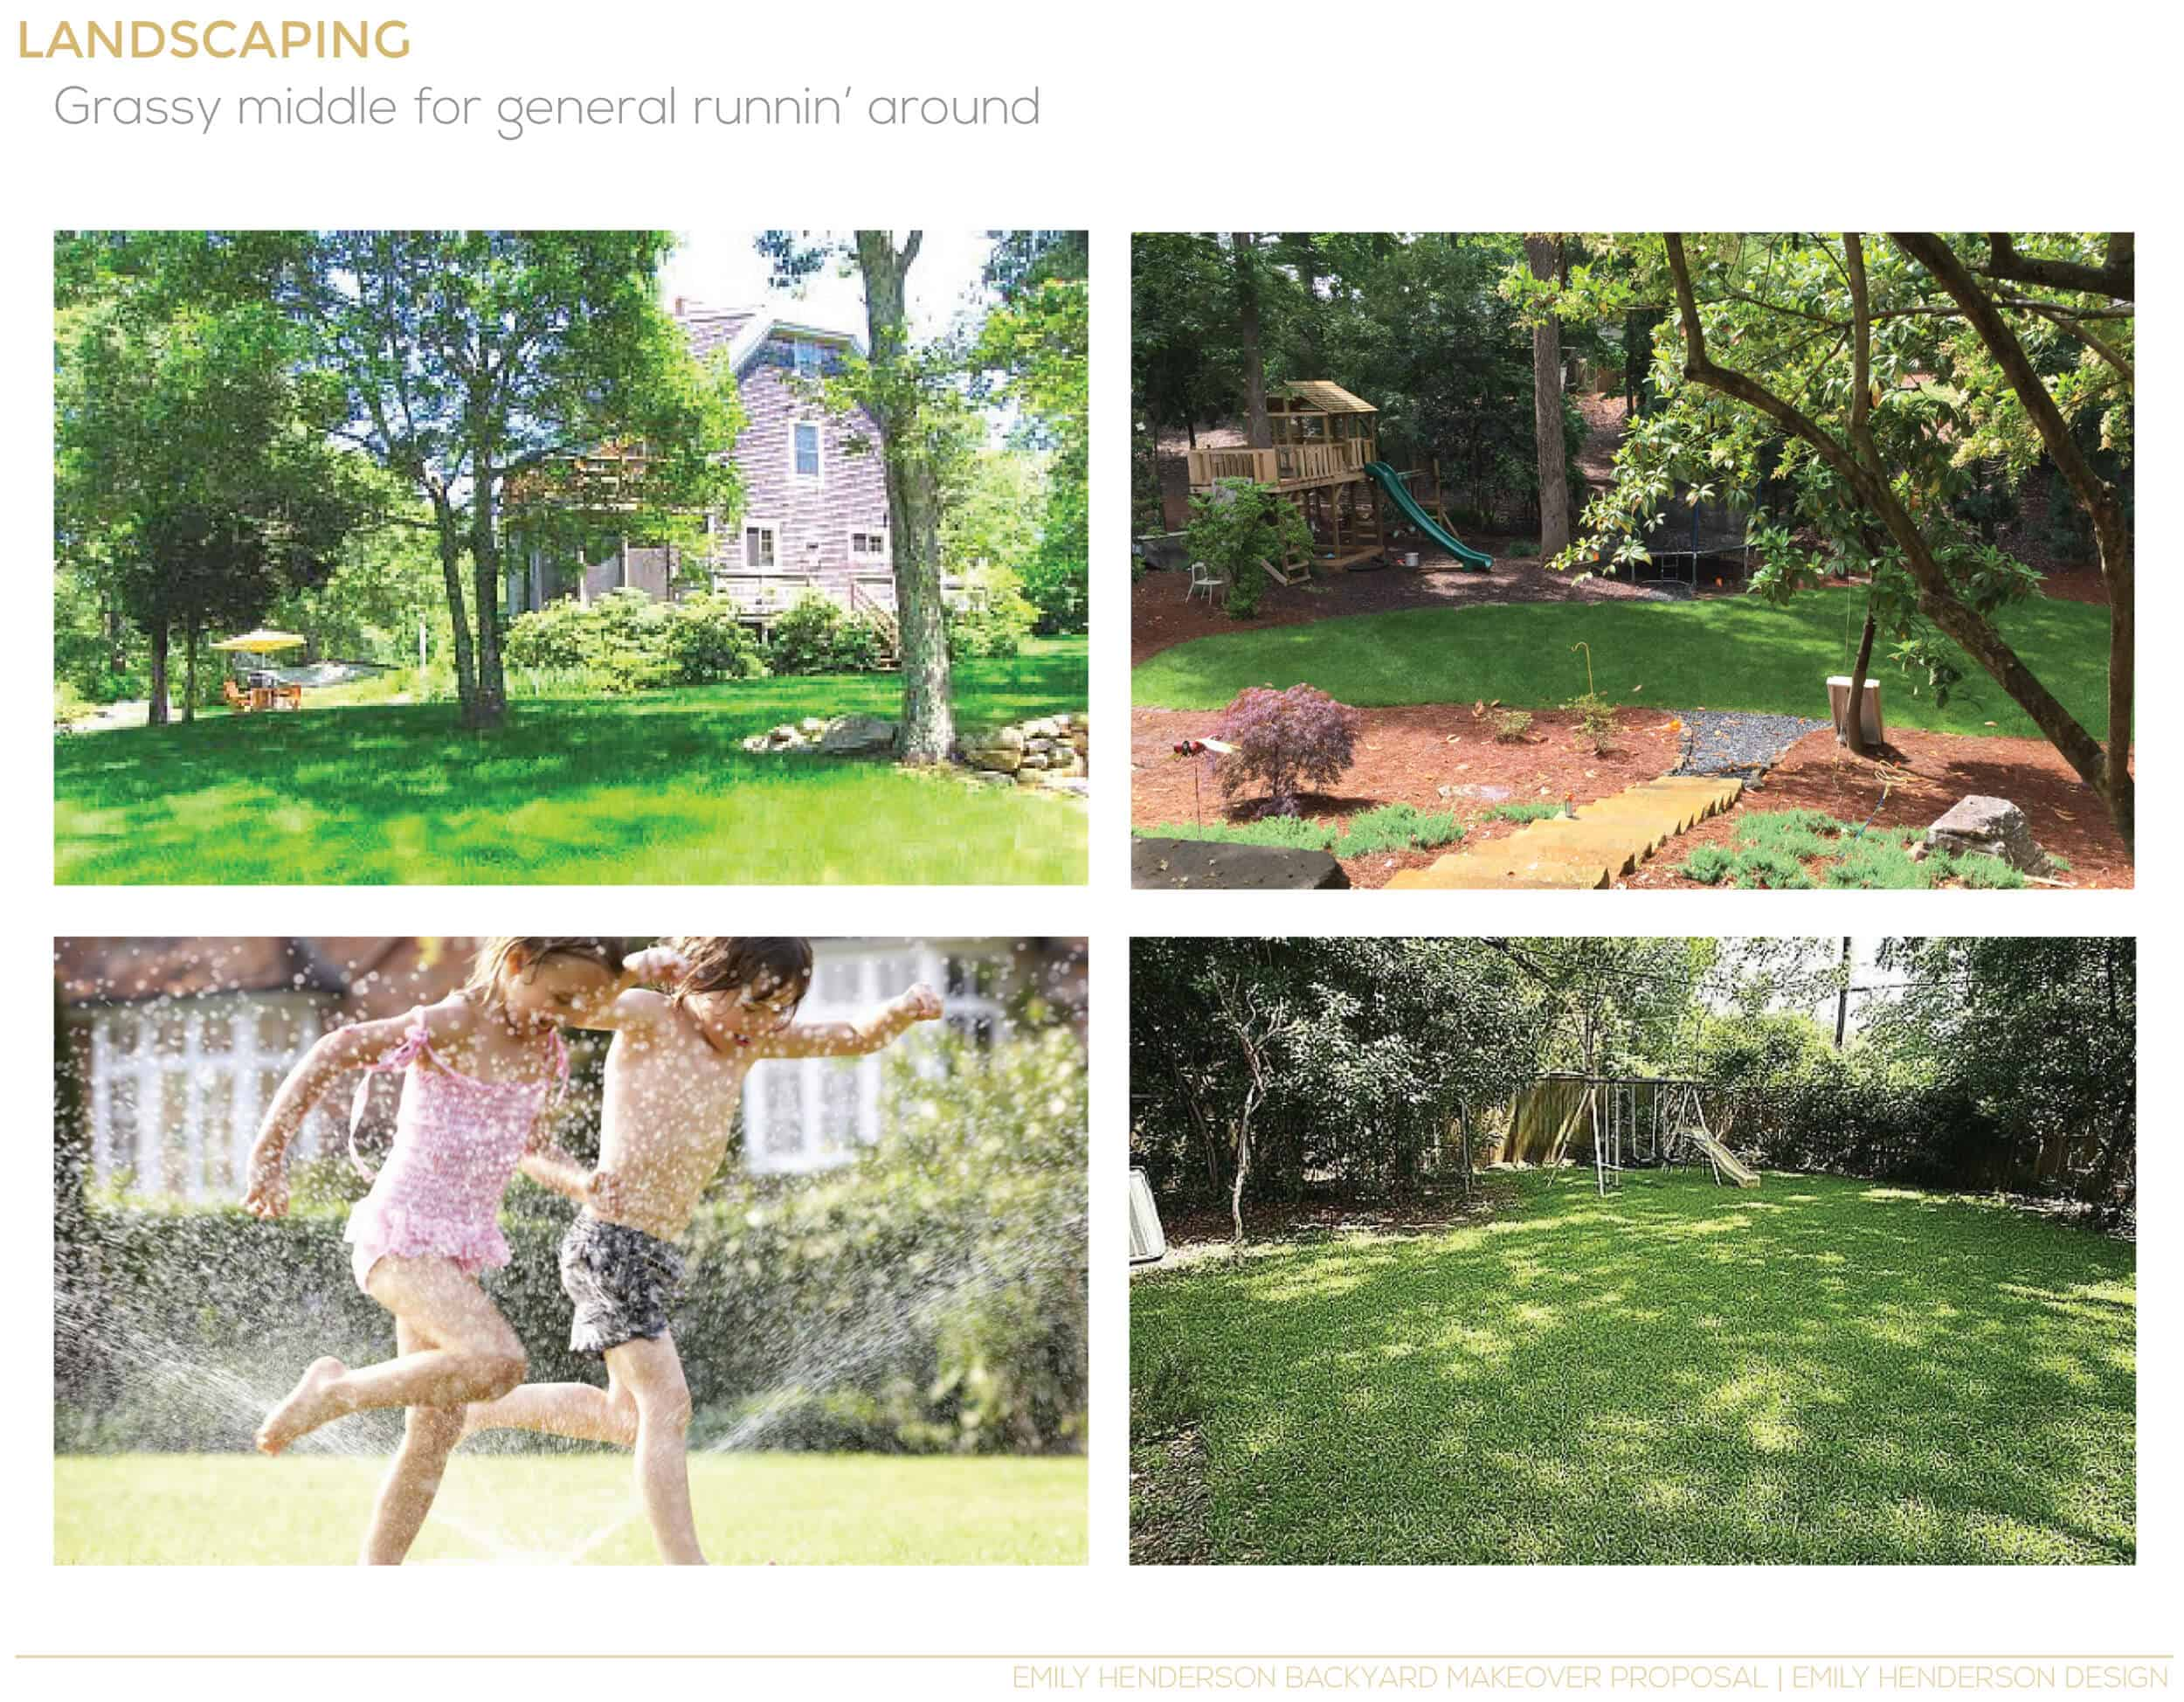 emily-henderson_waverly_backyard-makeover-proposal_2016-4